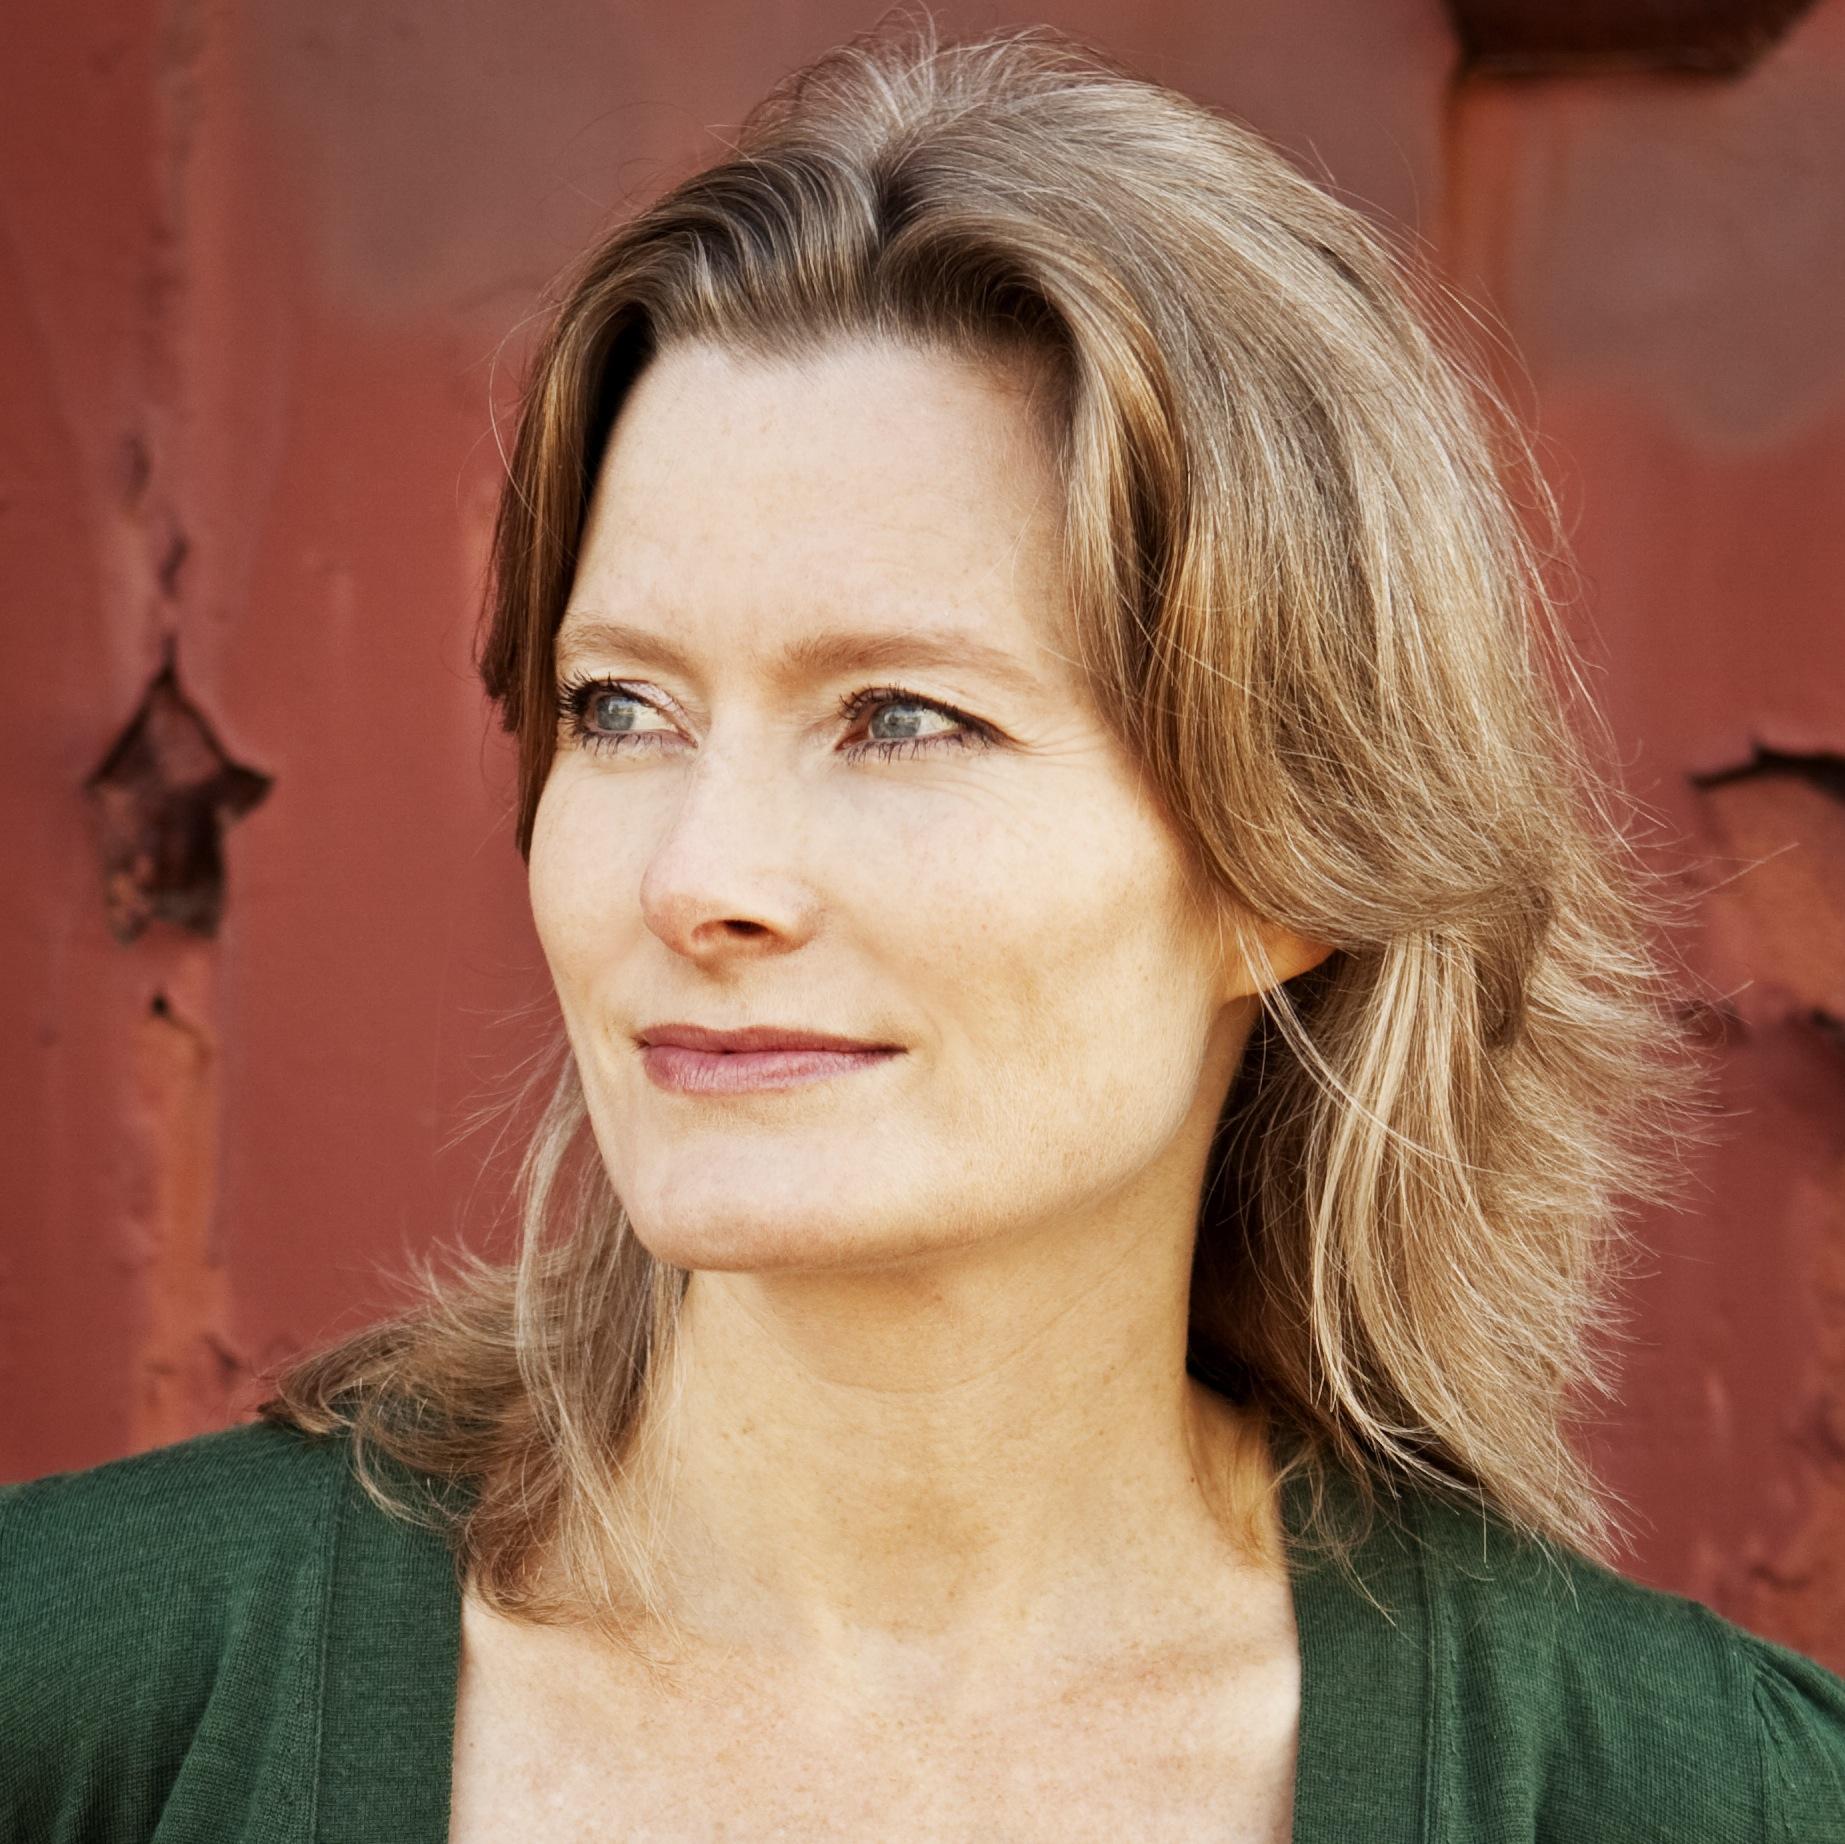 Photo of Jennifer Egan by Pieter M. Van Hattem